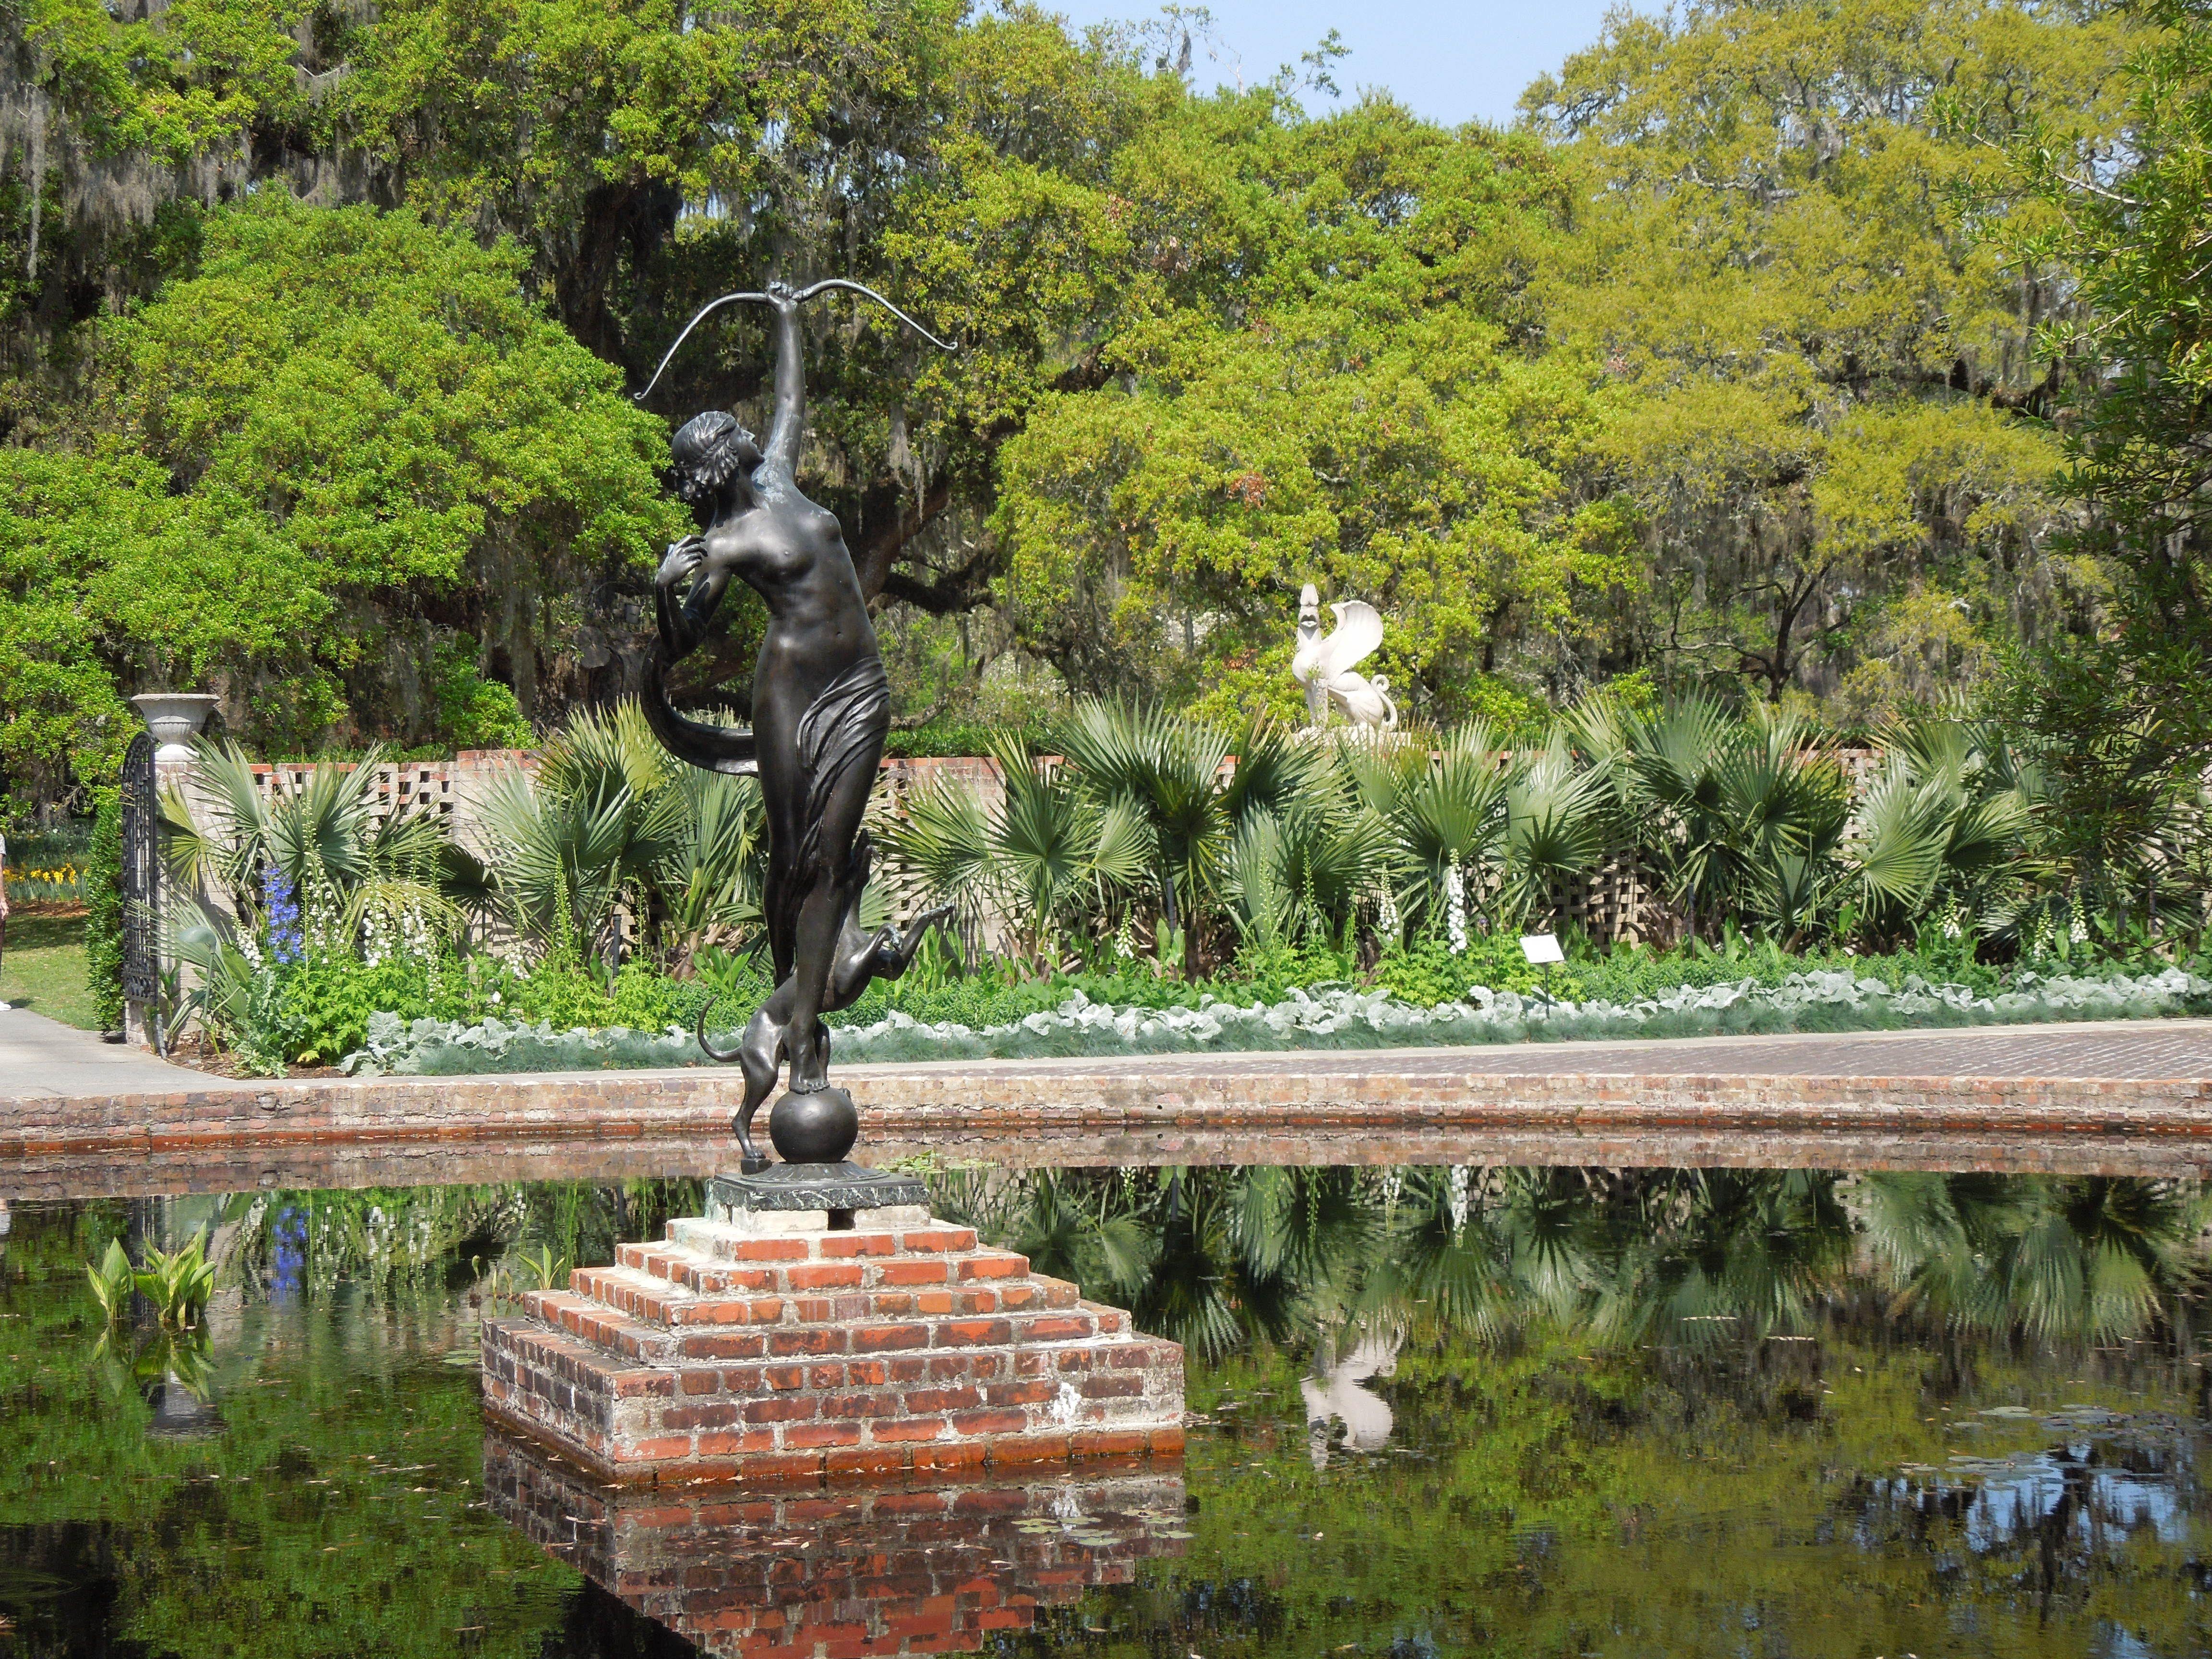 Part of the sculpture garden at Brookgreen Gardens in Pawleys Island ...